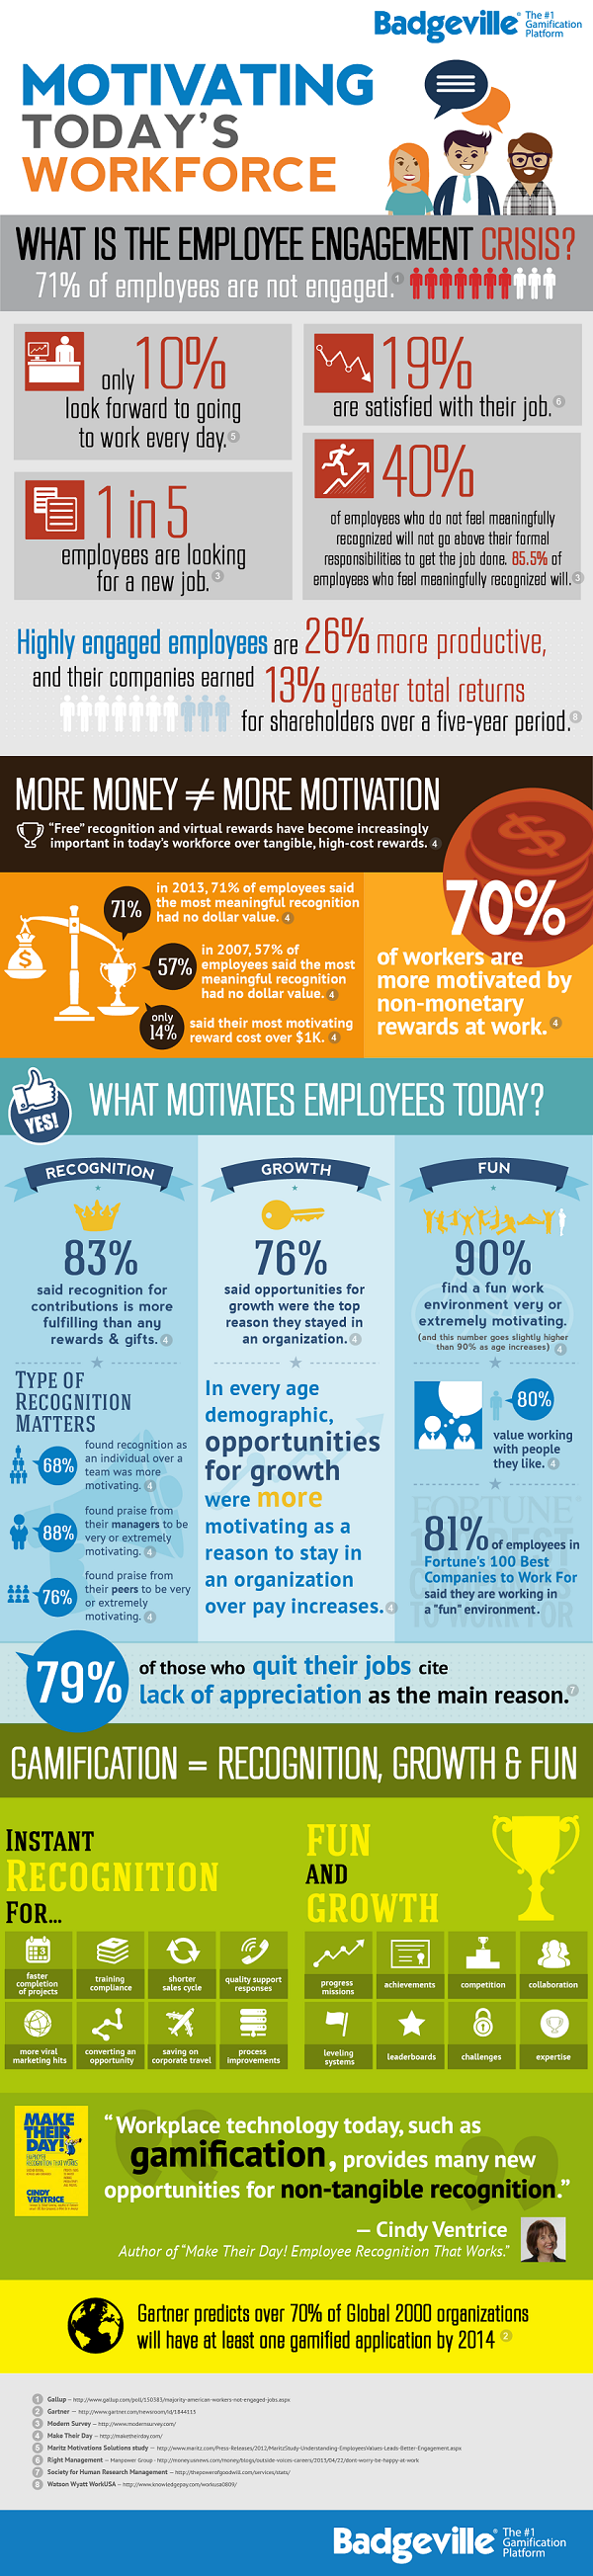 Motivating Todays Workforce